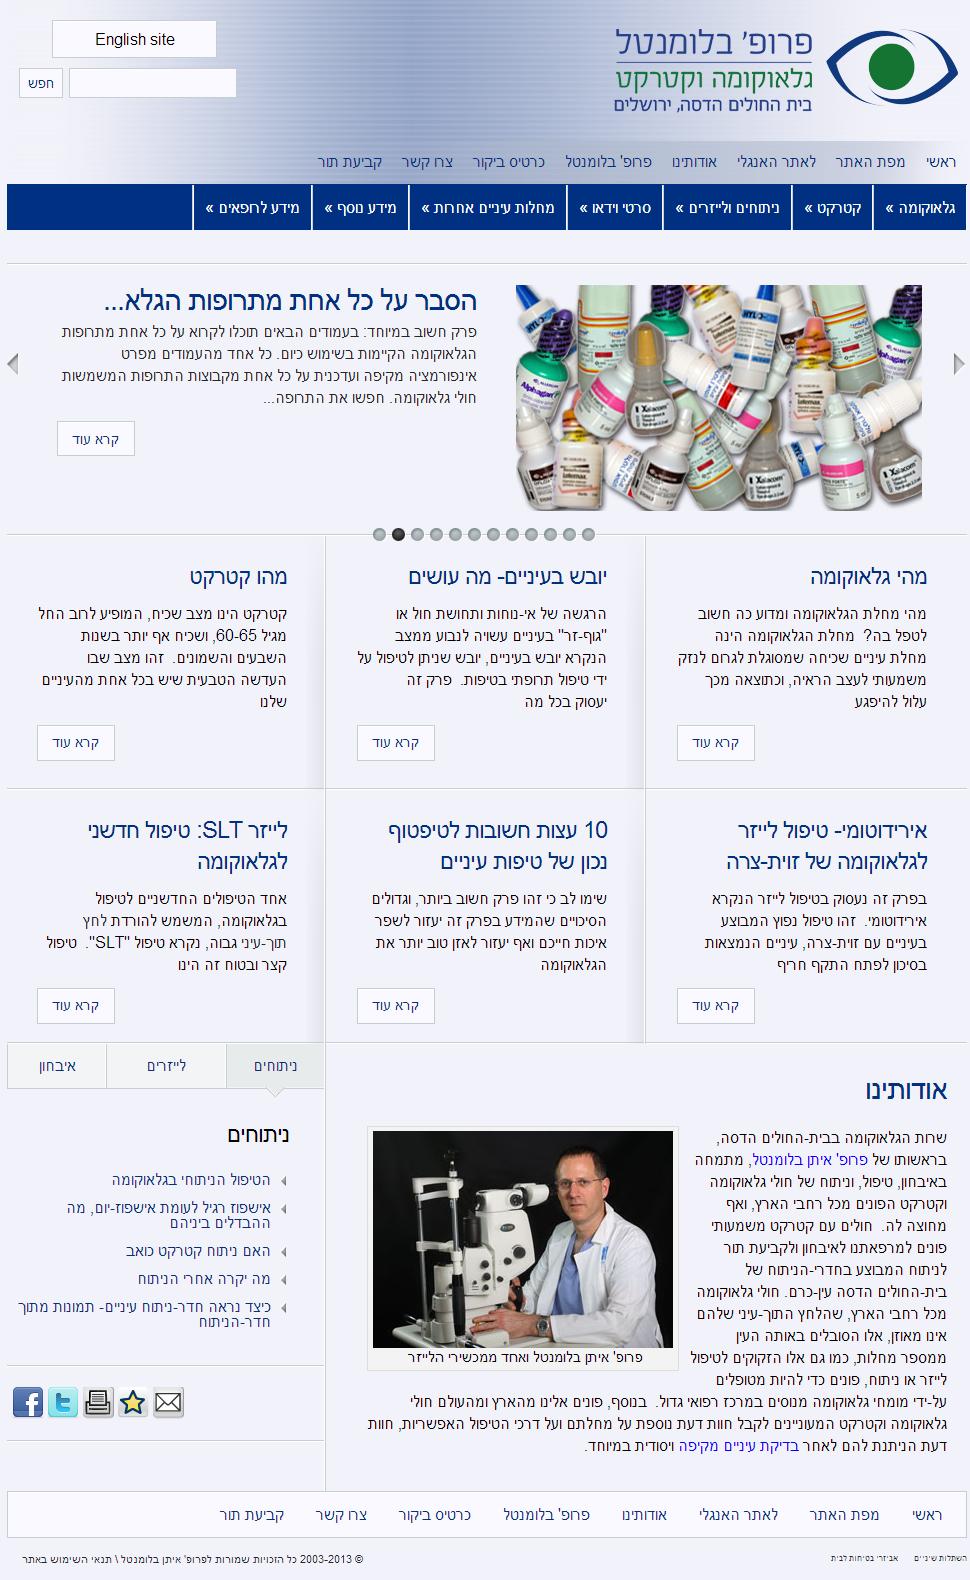 Current Website - WP